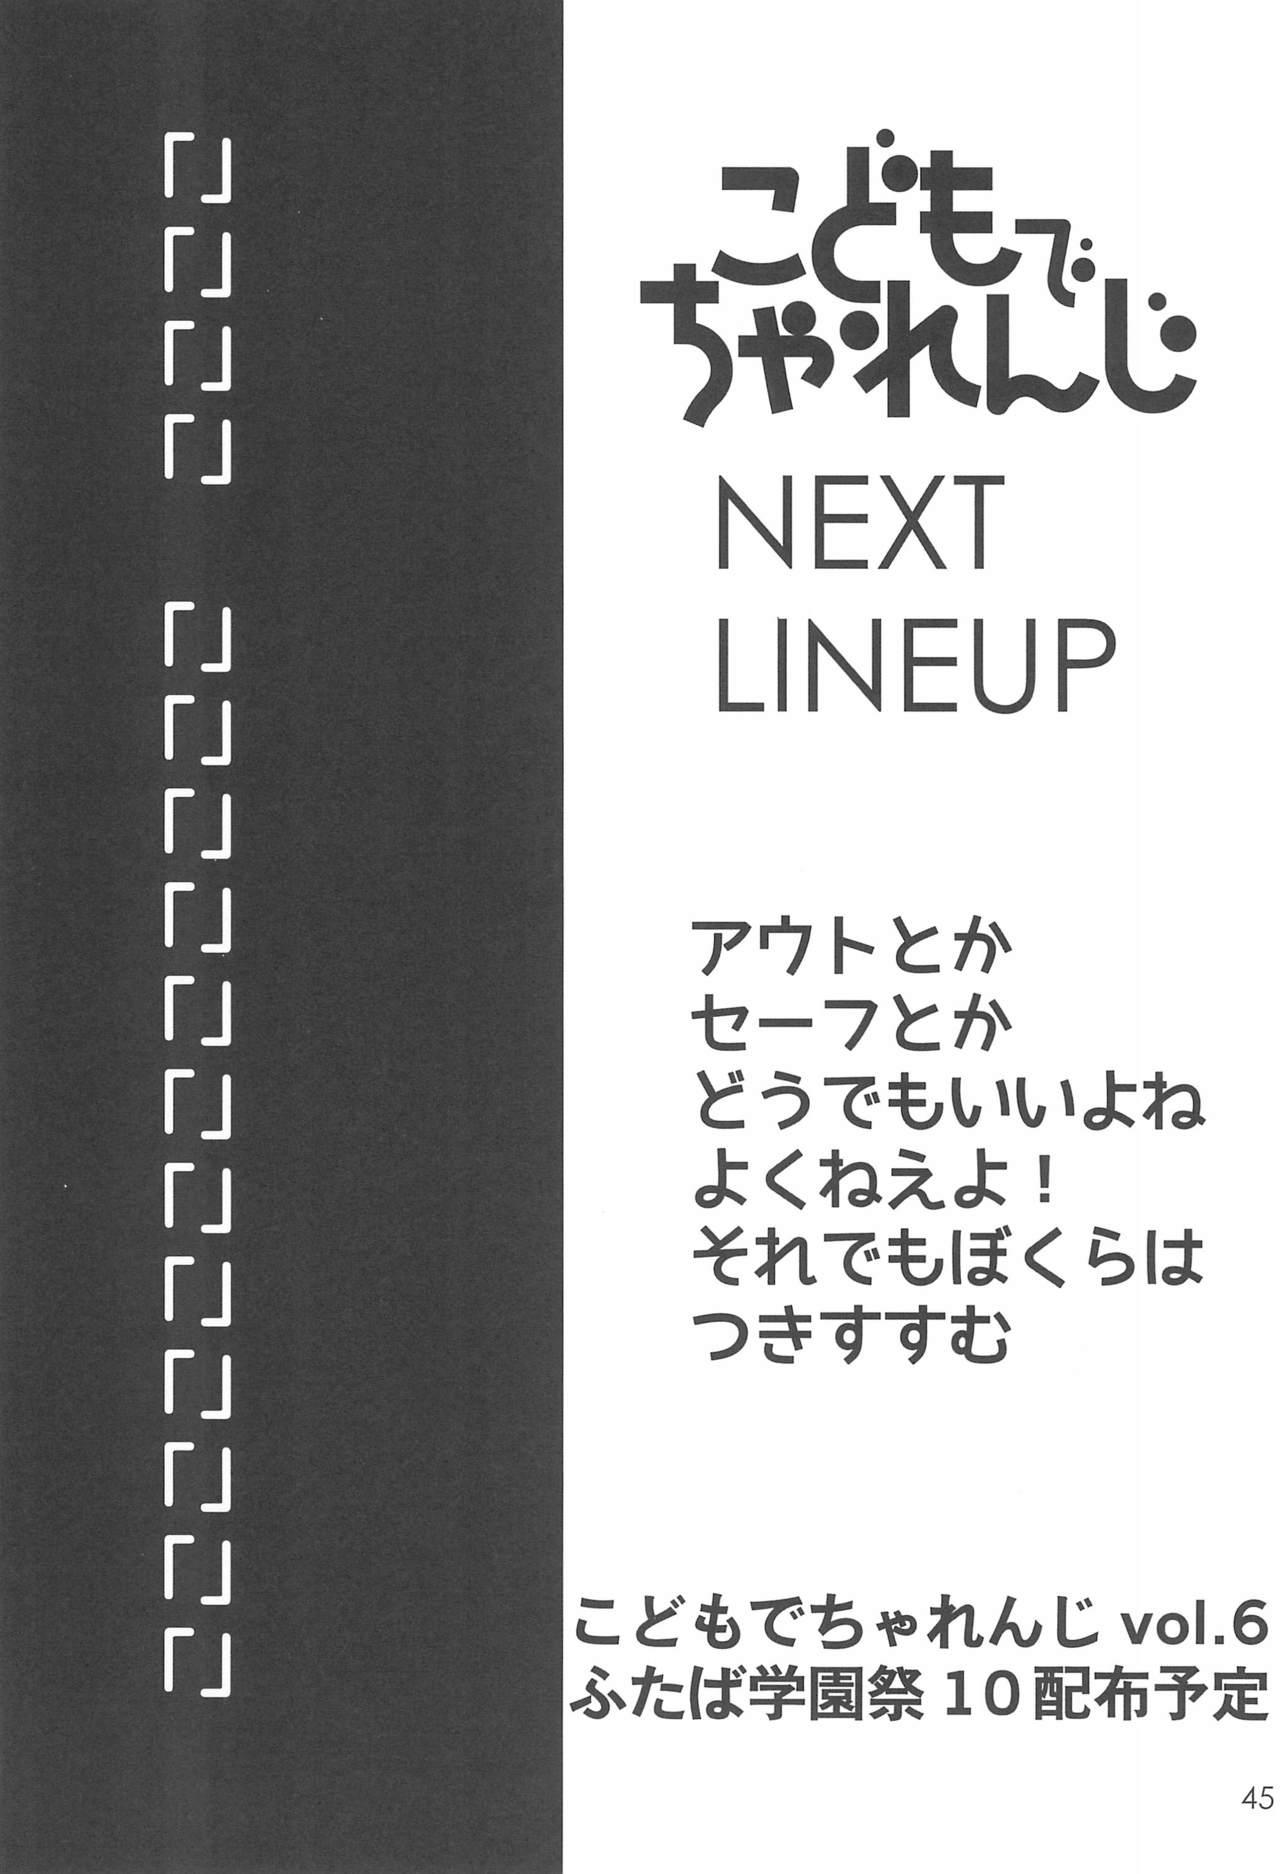 Kodomo de Challenge 5 44